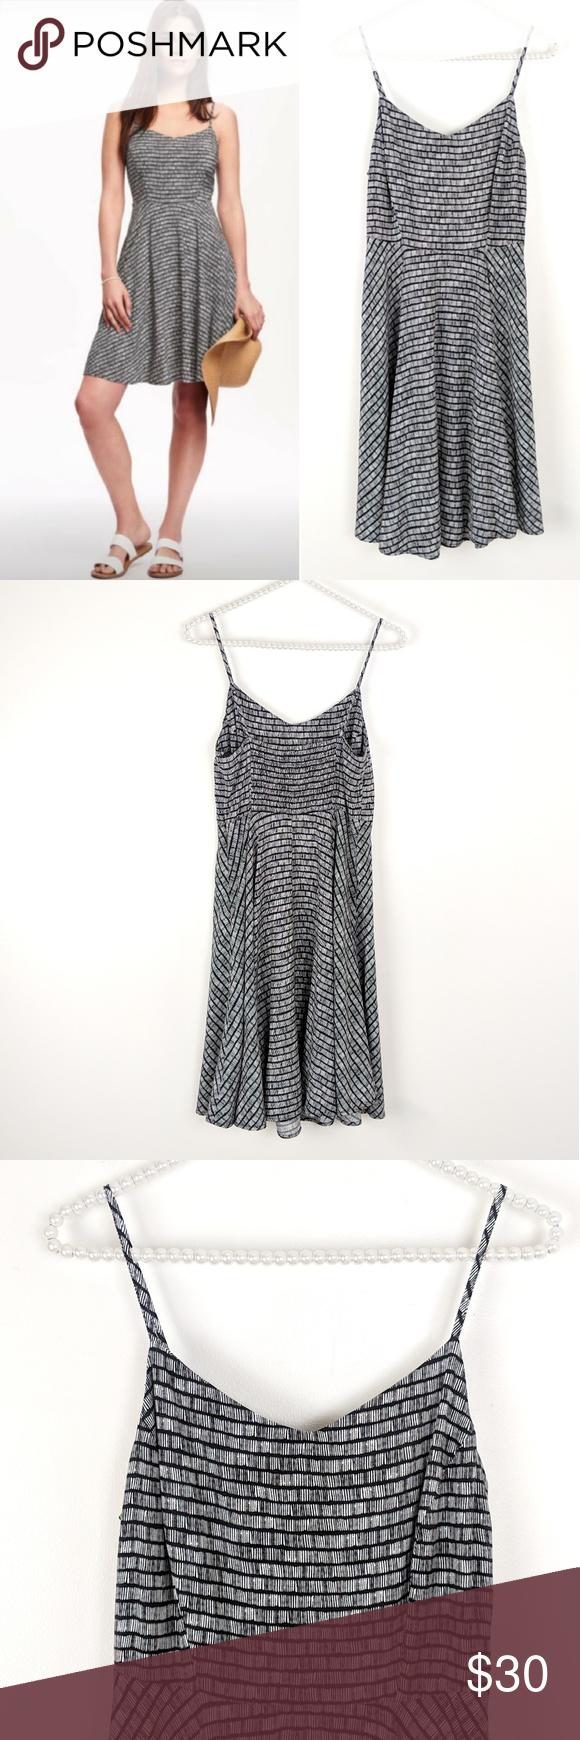 9940792373 I just added this listing on Poshmark  Old Navy Cami Dress Black   White  Sundress